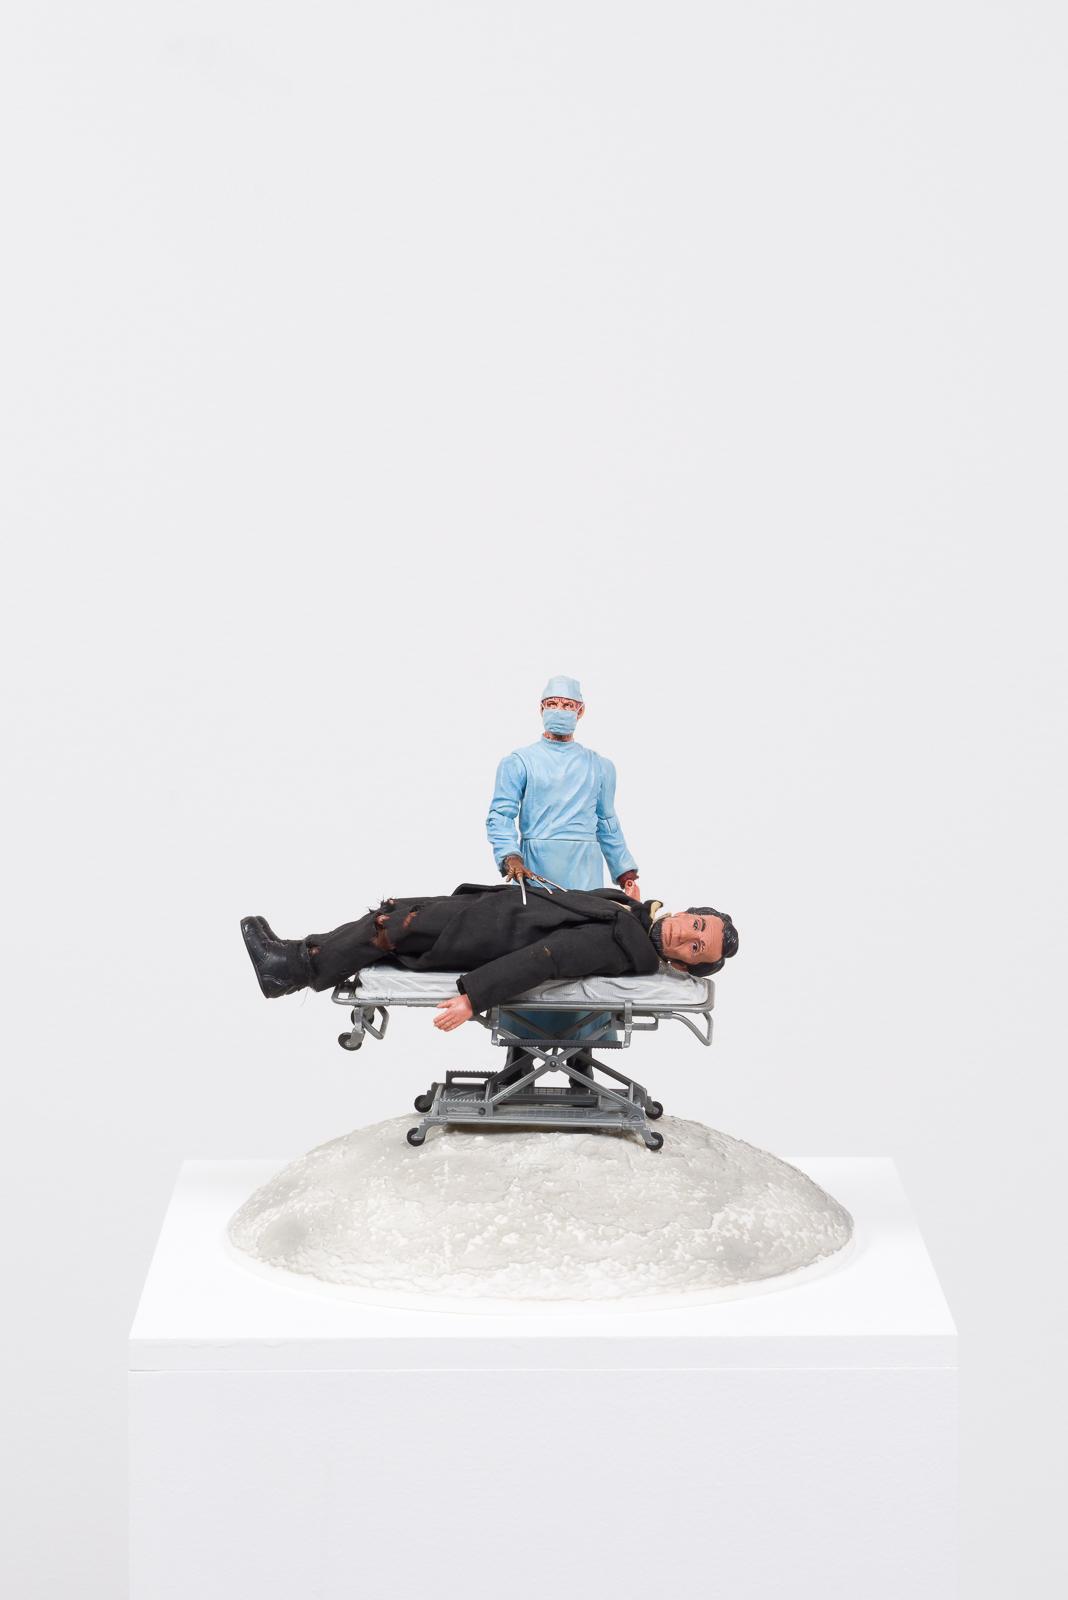 Healthcare Cuts, 2017  Plastic moon model, plastic hospital gurney, plastic and vinyl action figures, pedestal